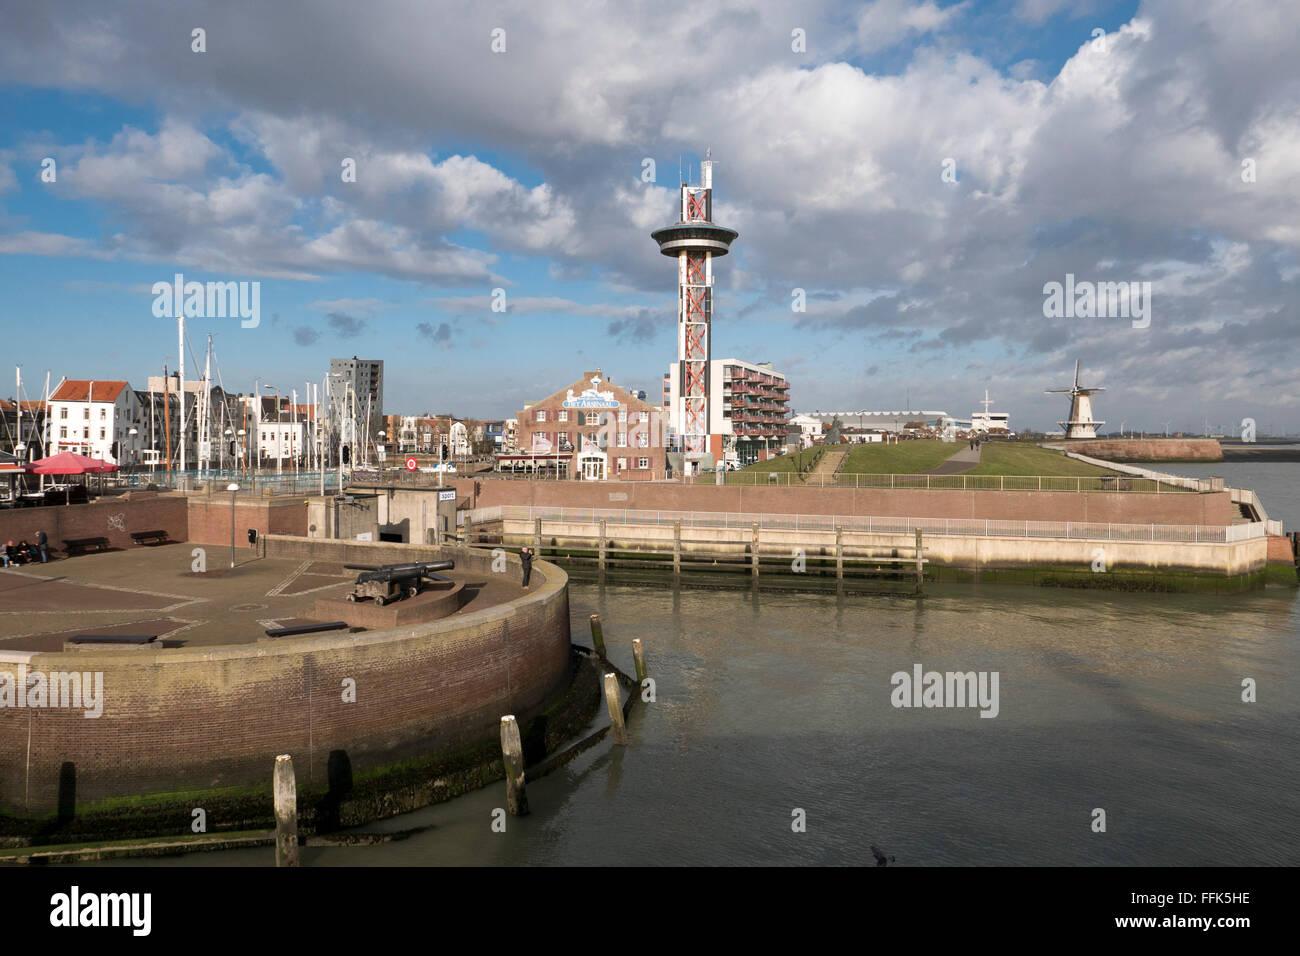 Hafen, Vlissingen, Provinz Seeland, Niederlande | harbour, Vlissingen, North Sea Coast, Zeeland, Netherlands - Stock Image